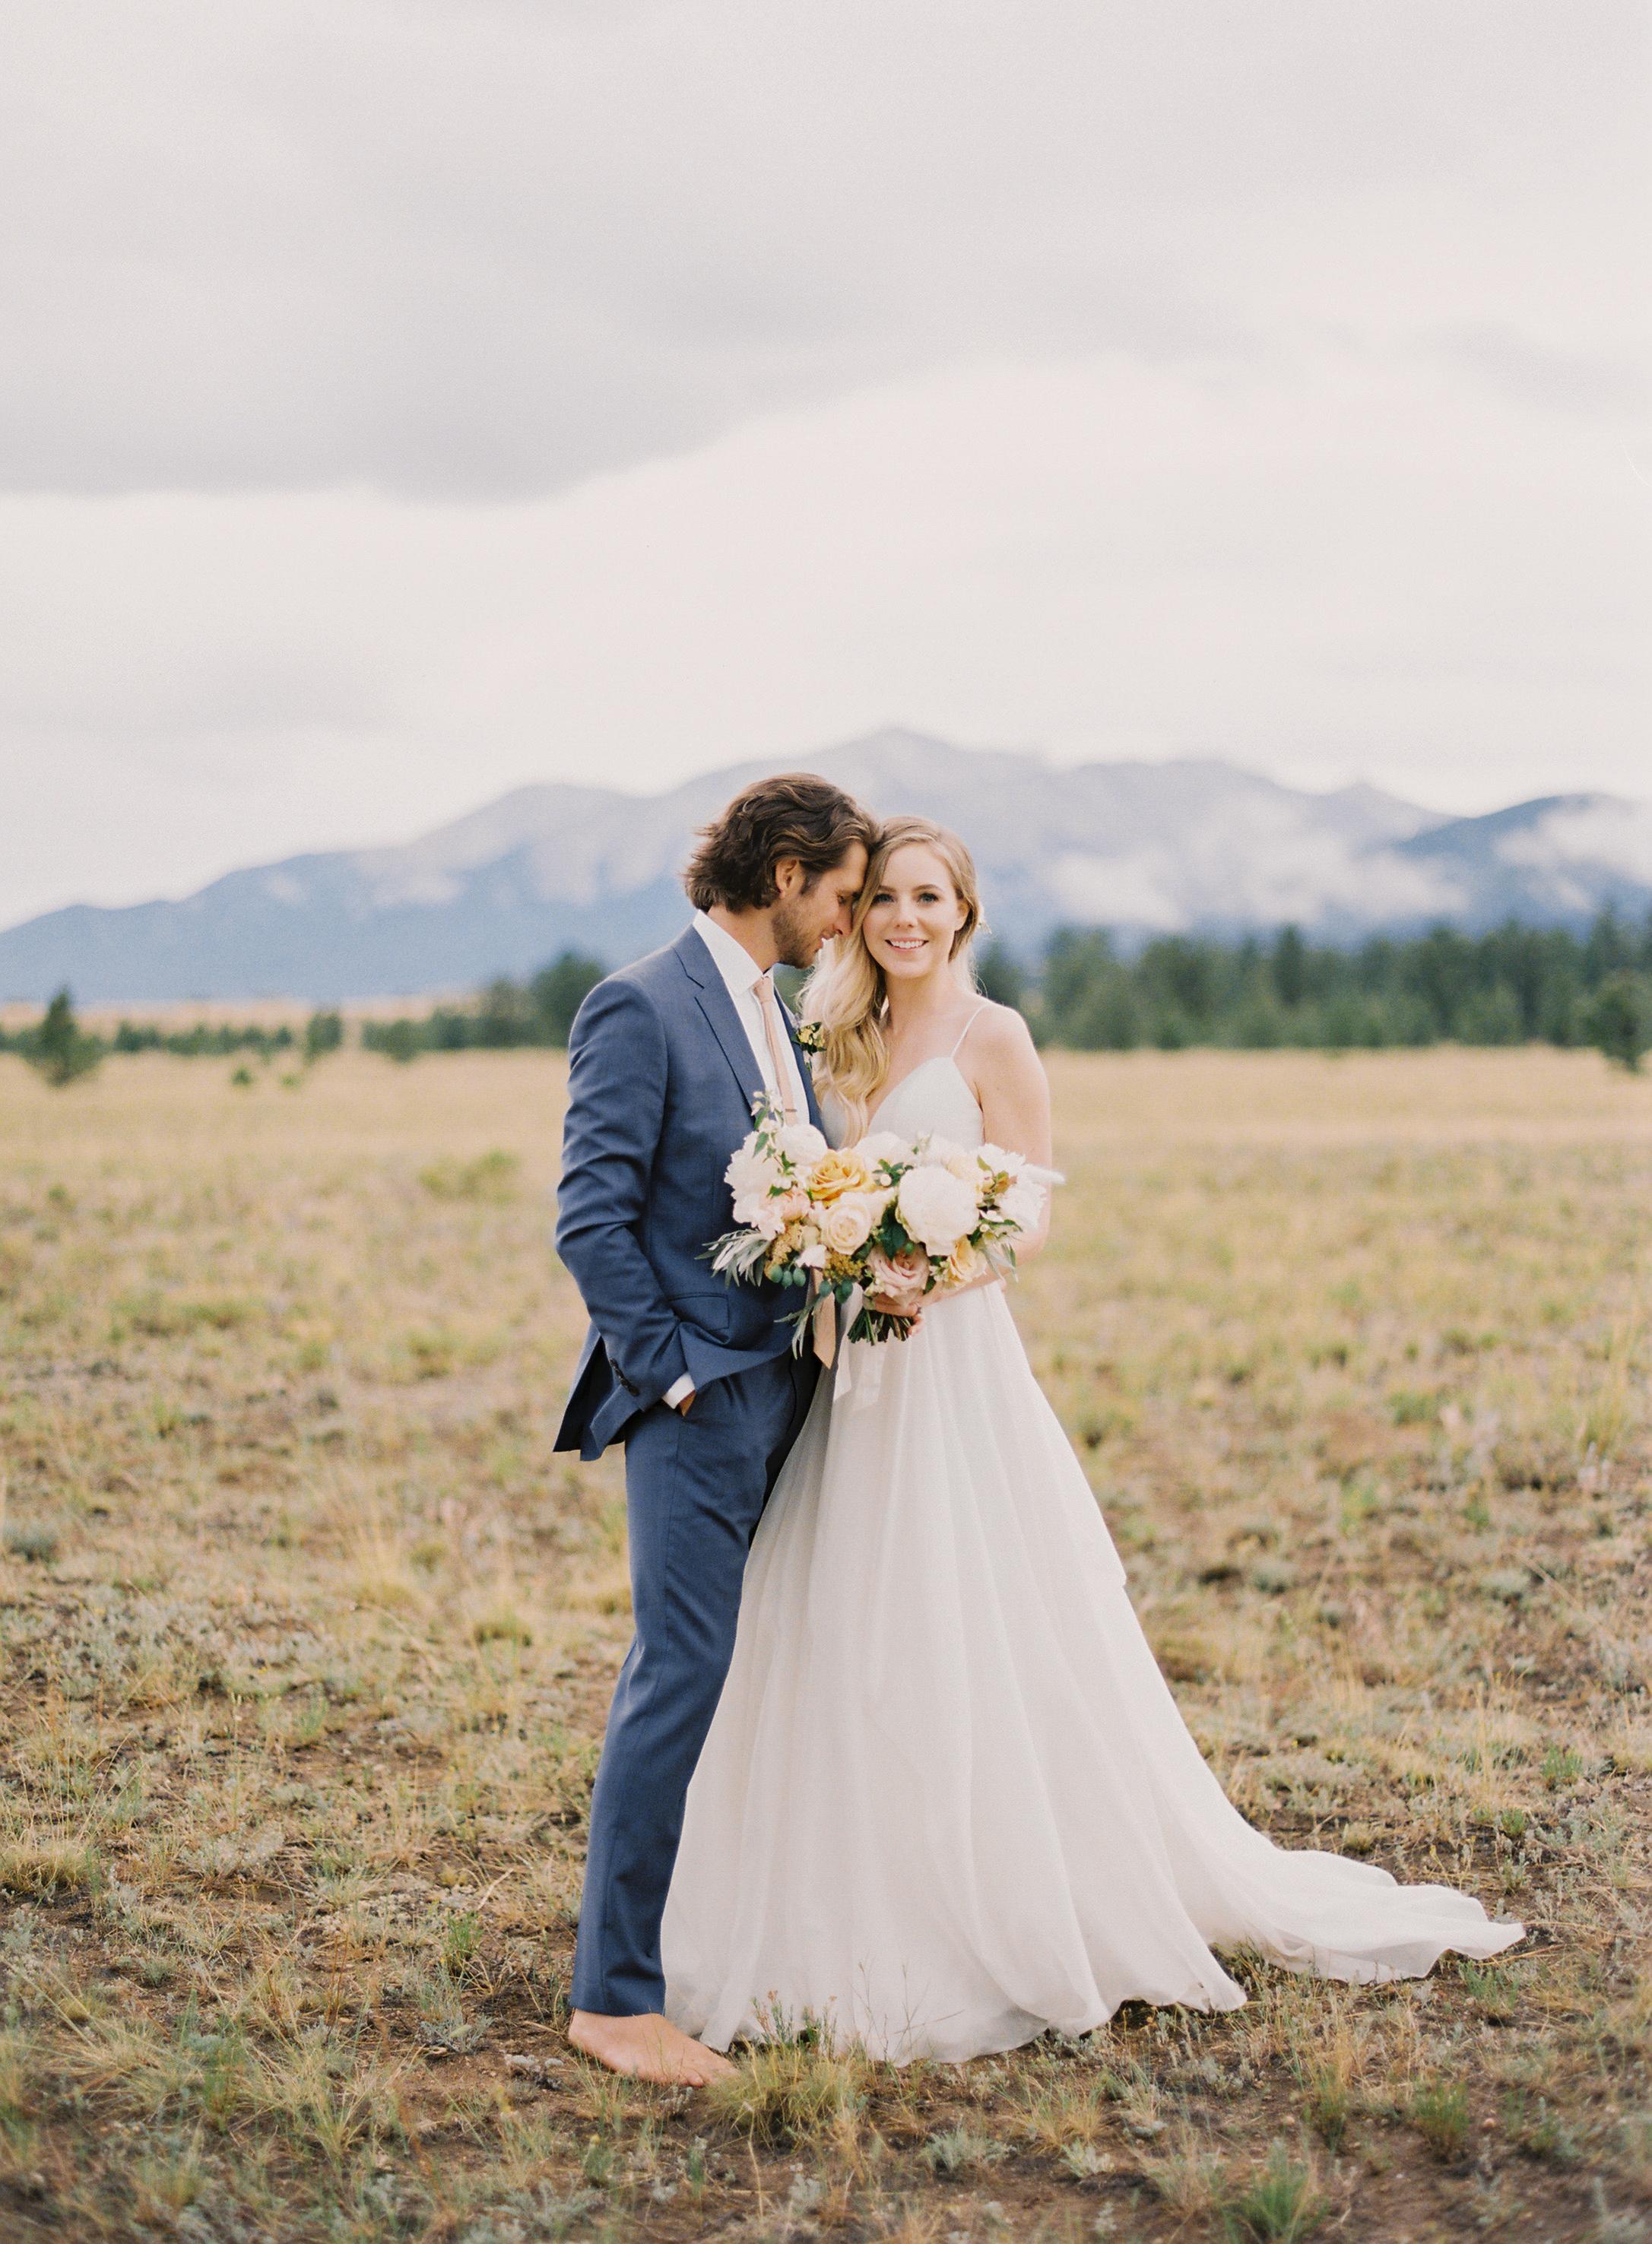 Jessica and Thomas-Wedding-Carrie King Photographer-27.jpg